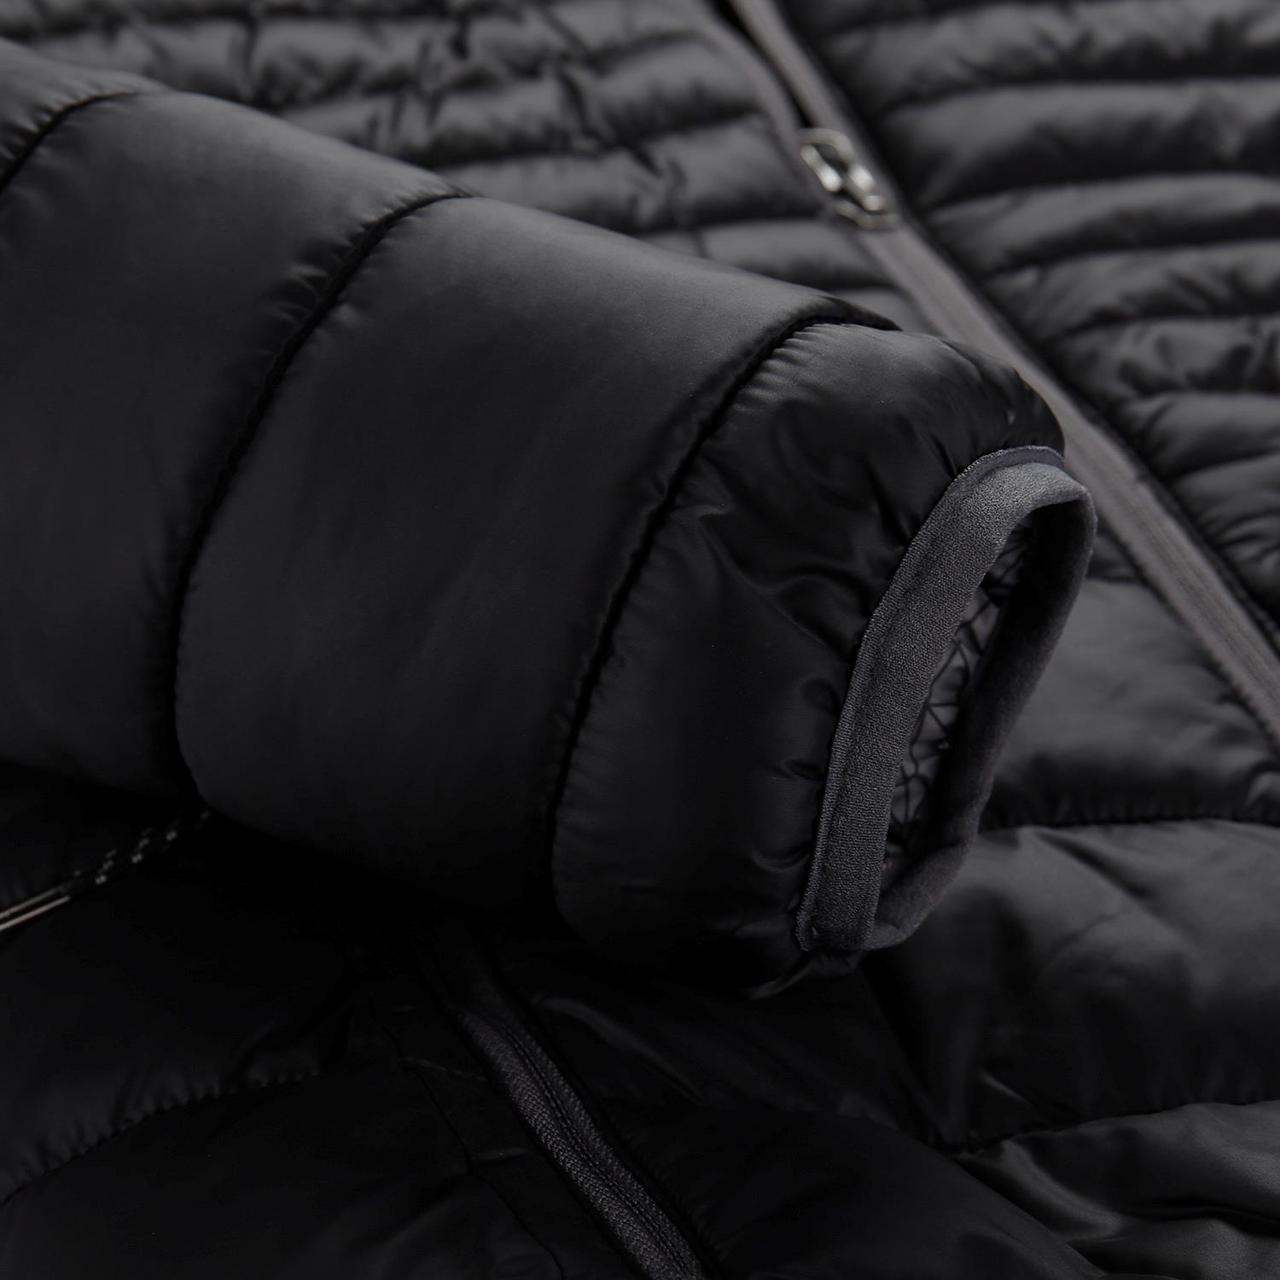 Куртка MUNSRA 5 - фото 7